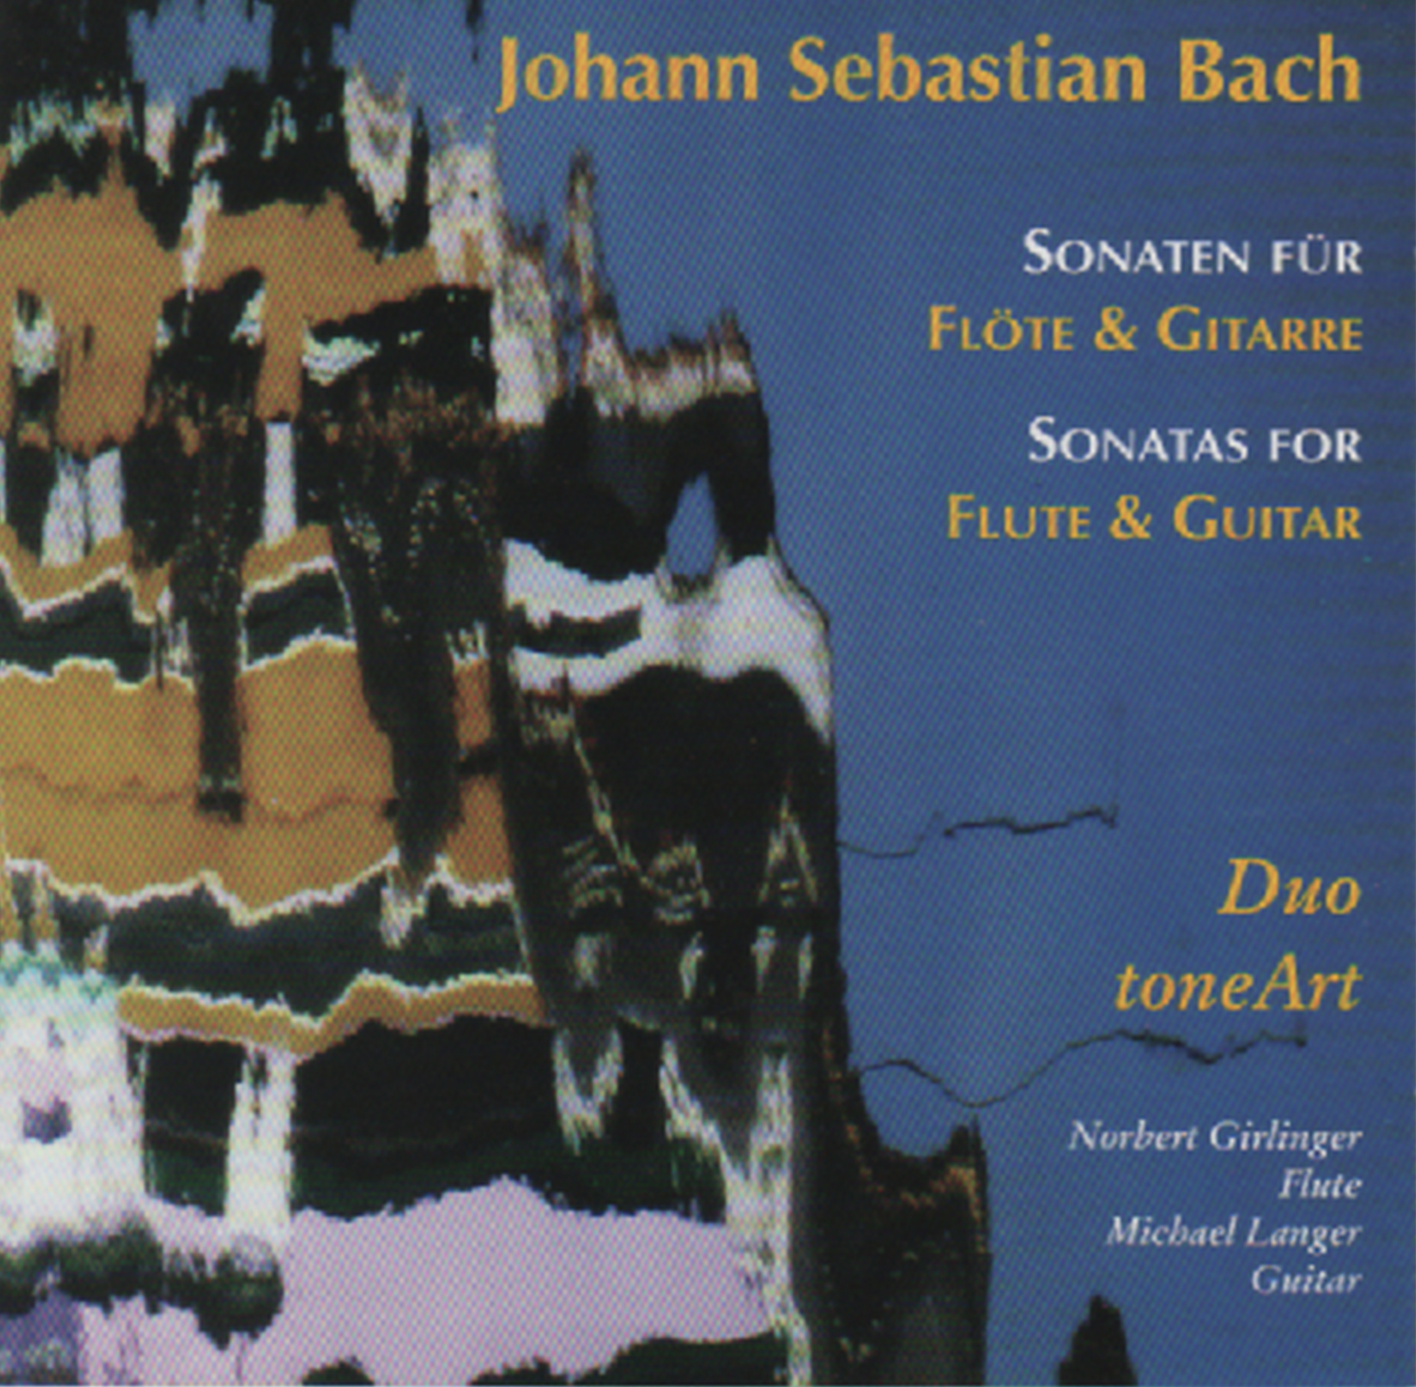 CD Johann Sebastian Bach – Sonaten für Flöte & Gitarre